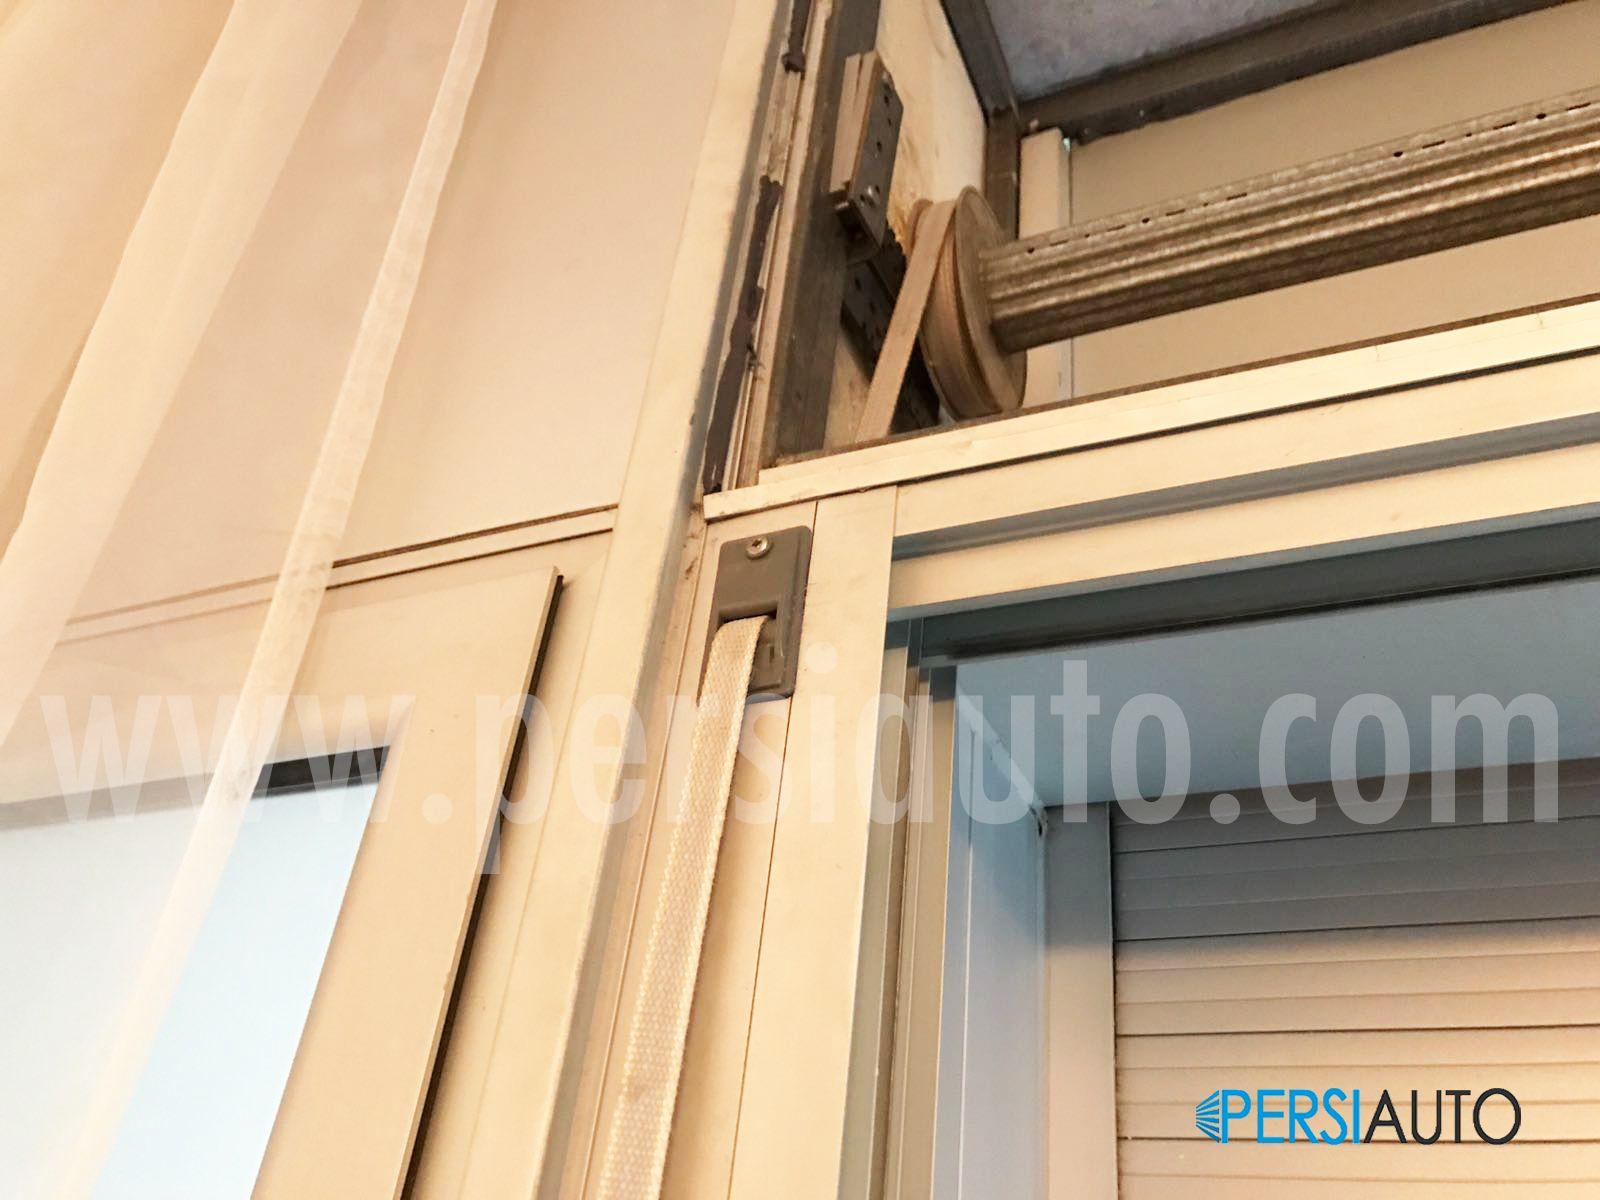 Cambiar cinta persiana compacta latest free cheap great - Colocar cinta persiana ...